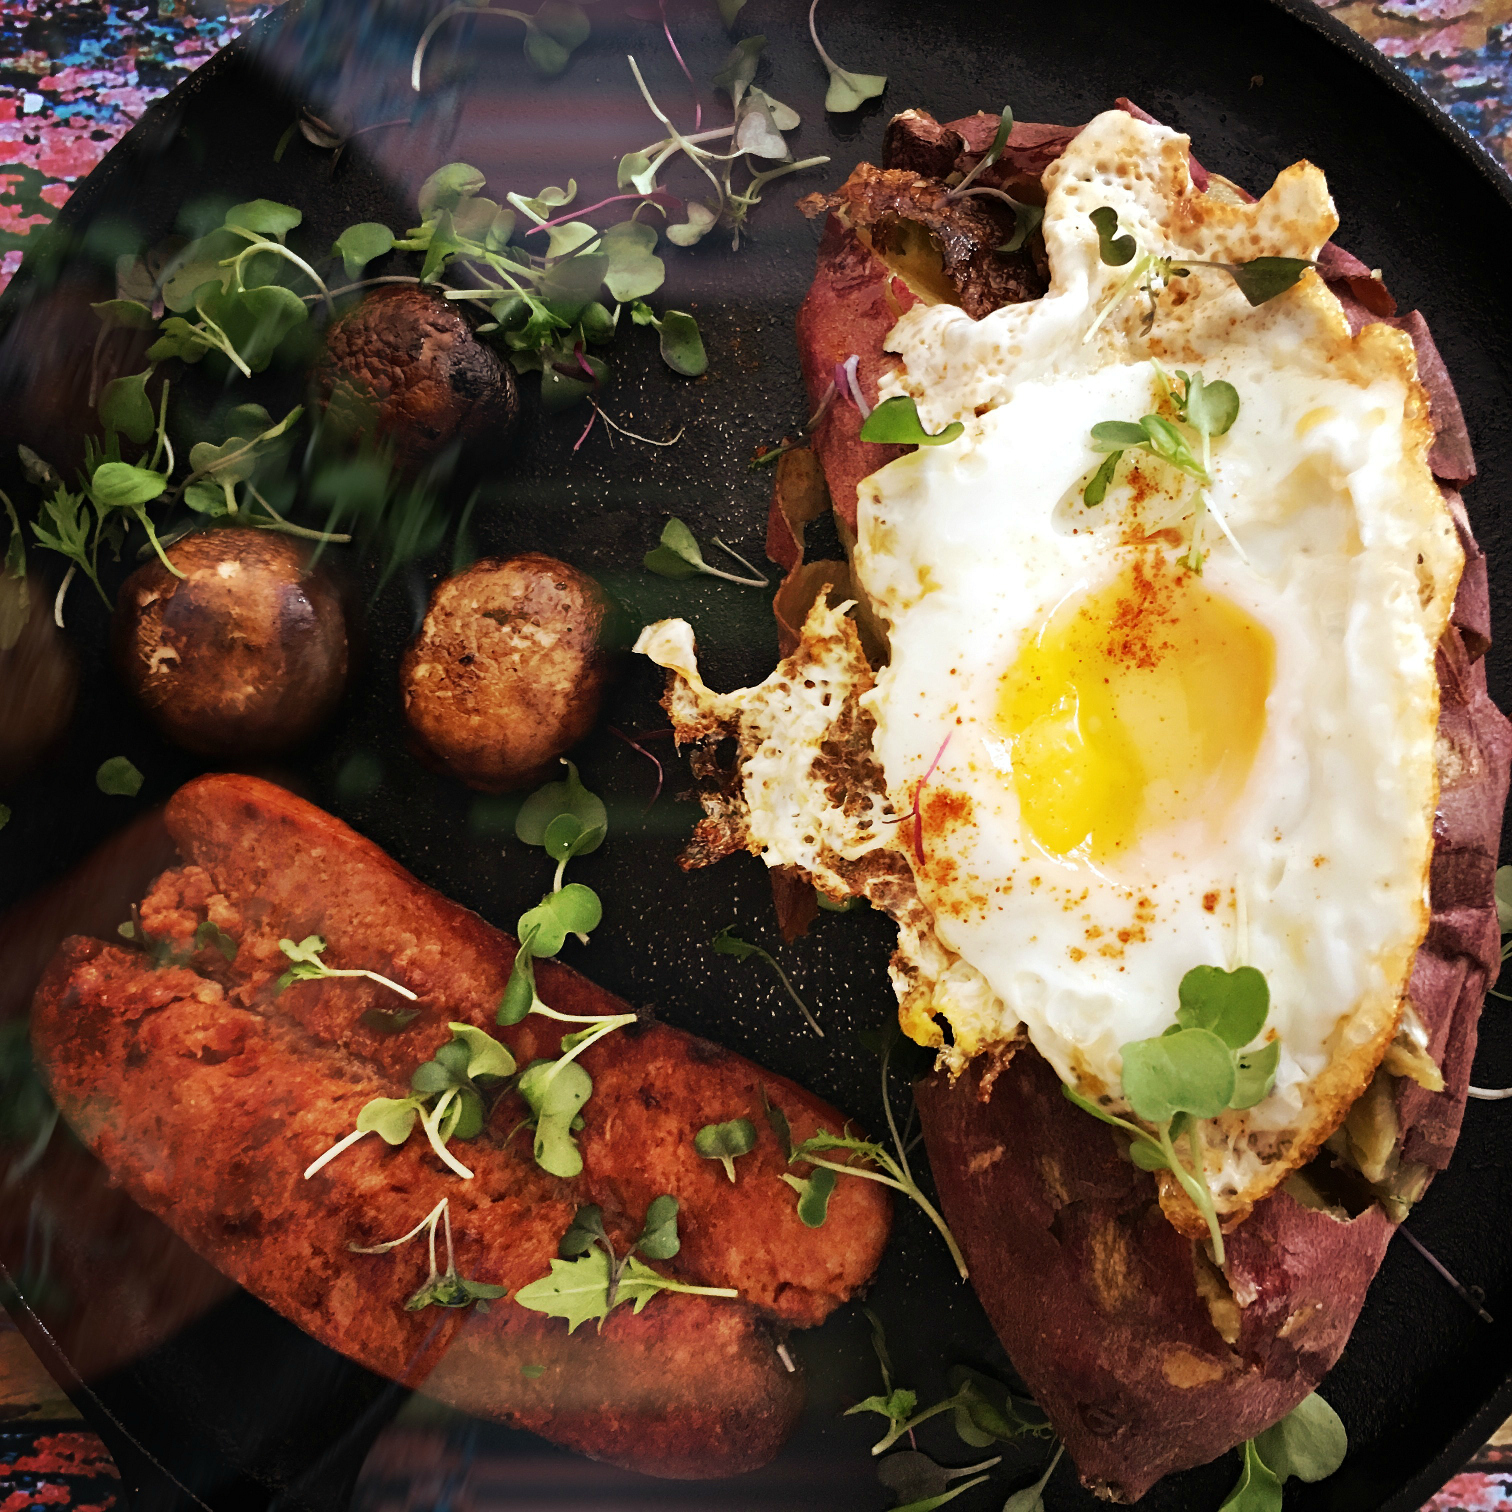 ©Yam and Chorizo in Pan by Dena T Bray